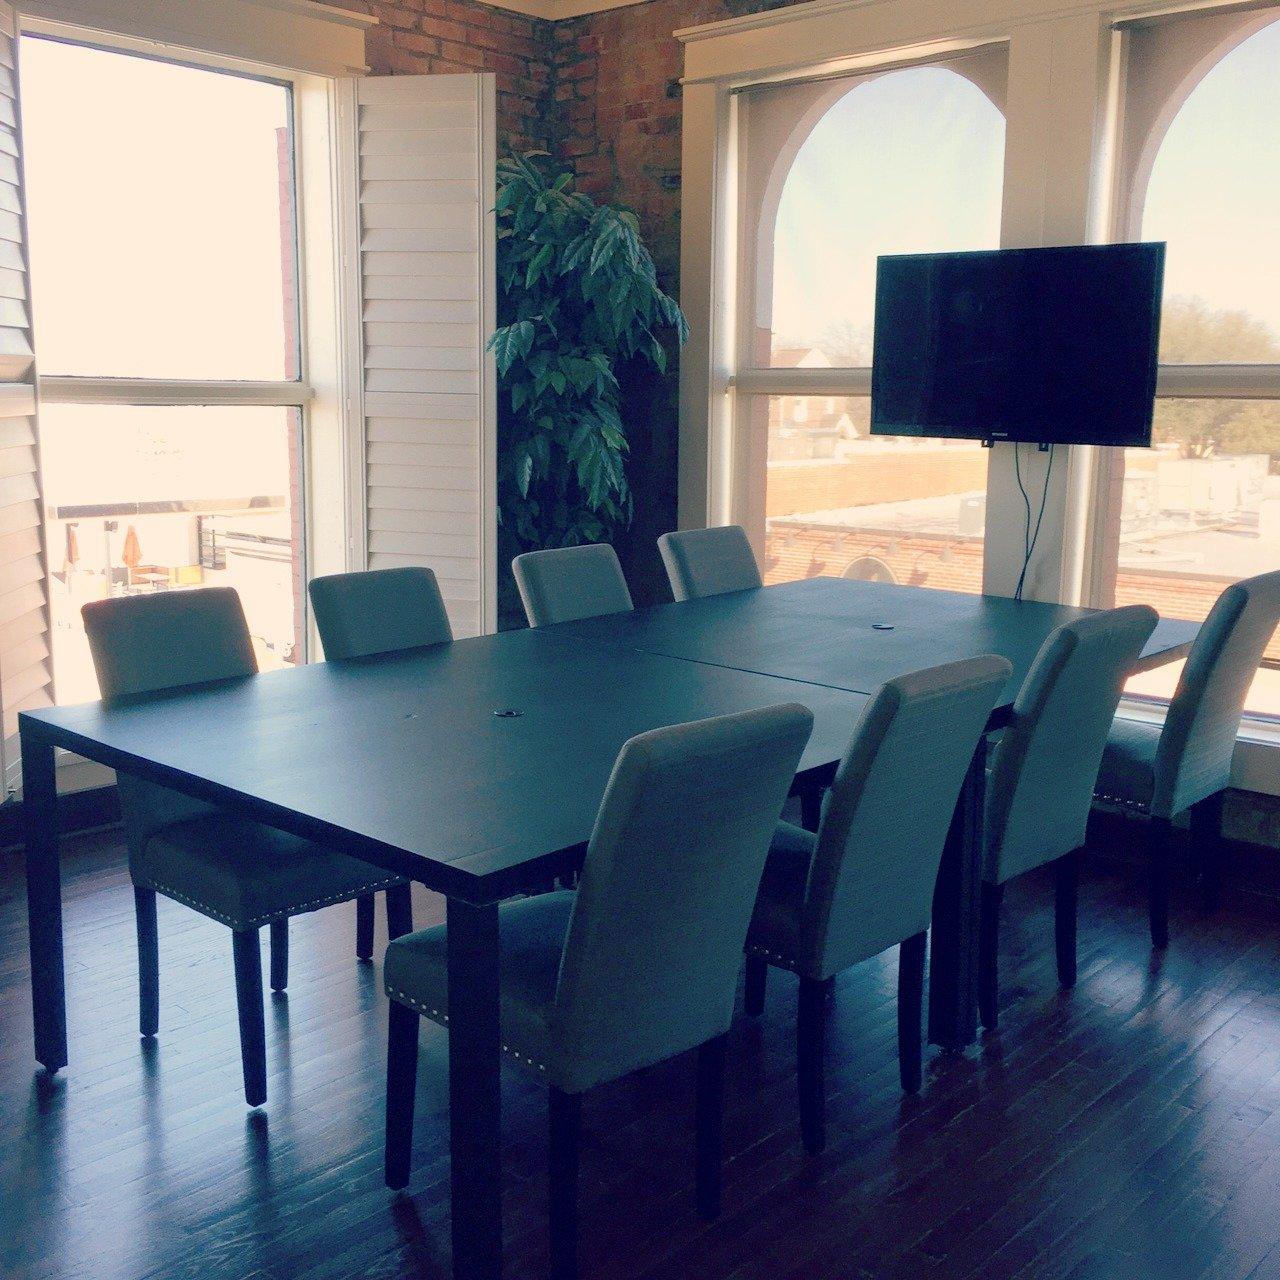 Interior barn doors custom barn doors near dallas plano frisco - Corporate Conference Tables Mckinney Texas